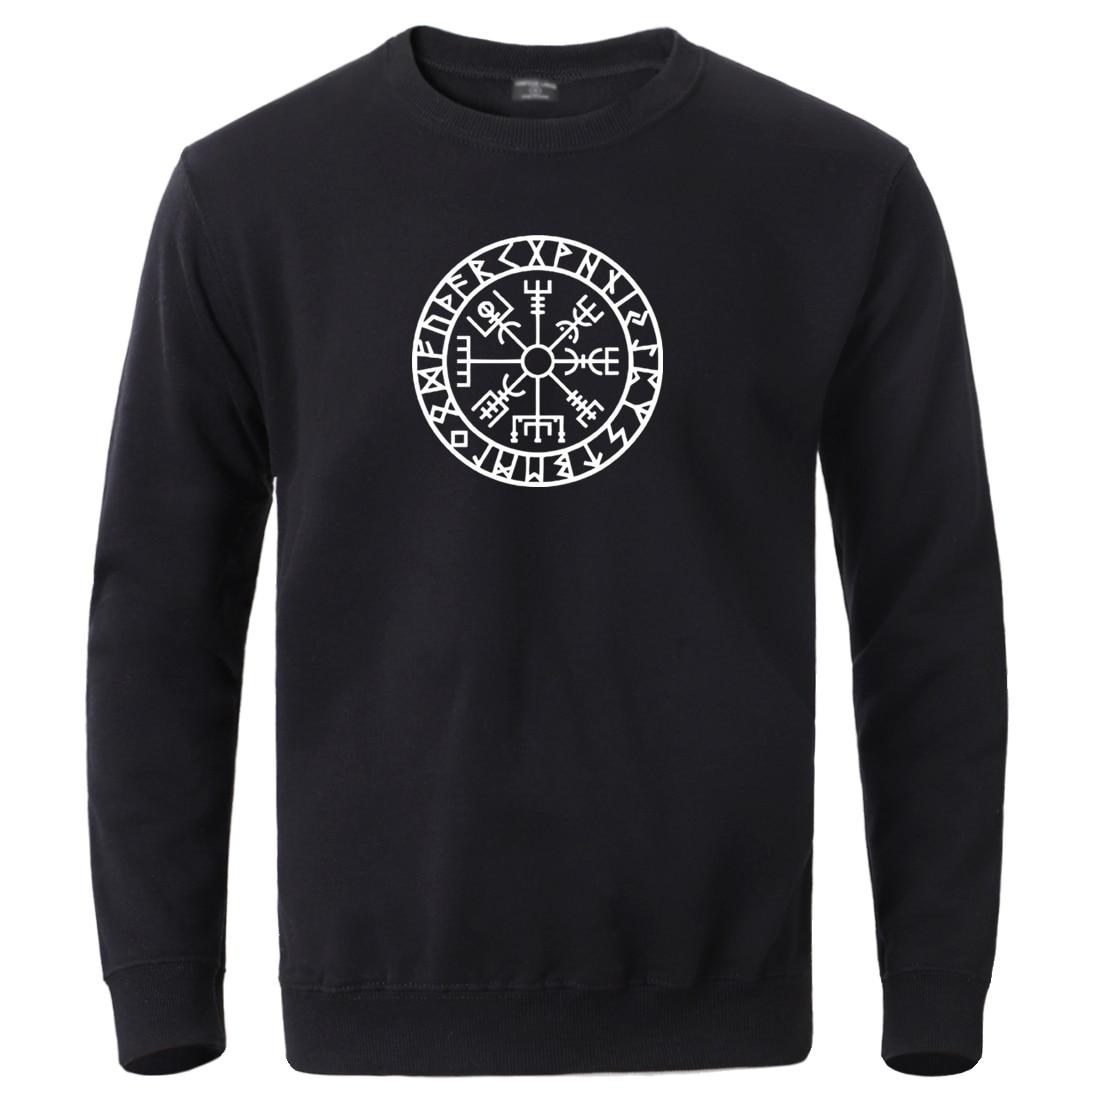 Viking Compass Sons Of Anarchy Streetwear Hoodies Mens 2020 Male Winter Autumn Fleece Gone To Valhalla Sportswear Crewneck Tops